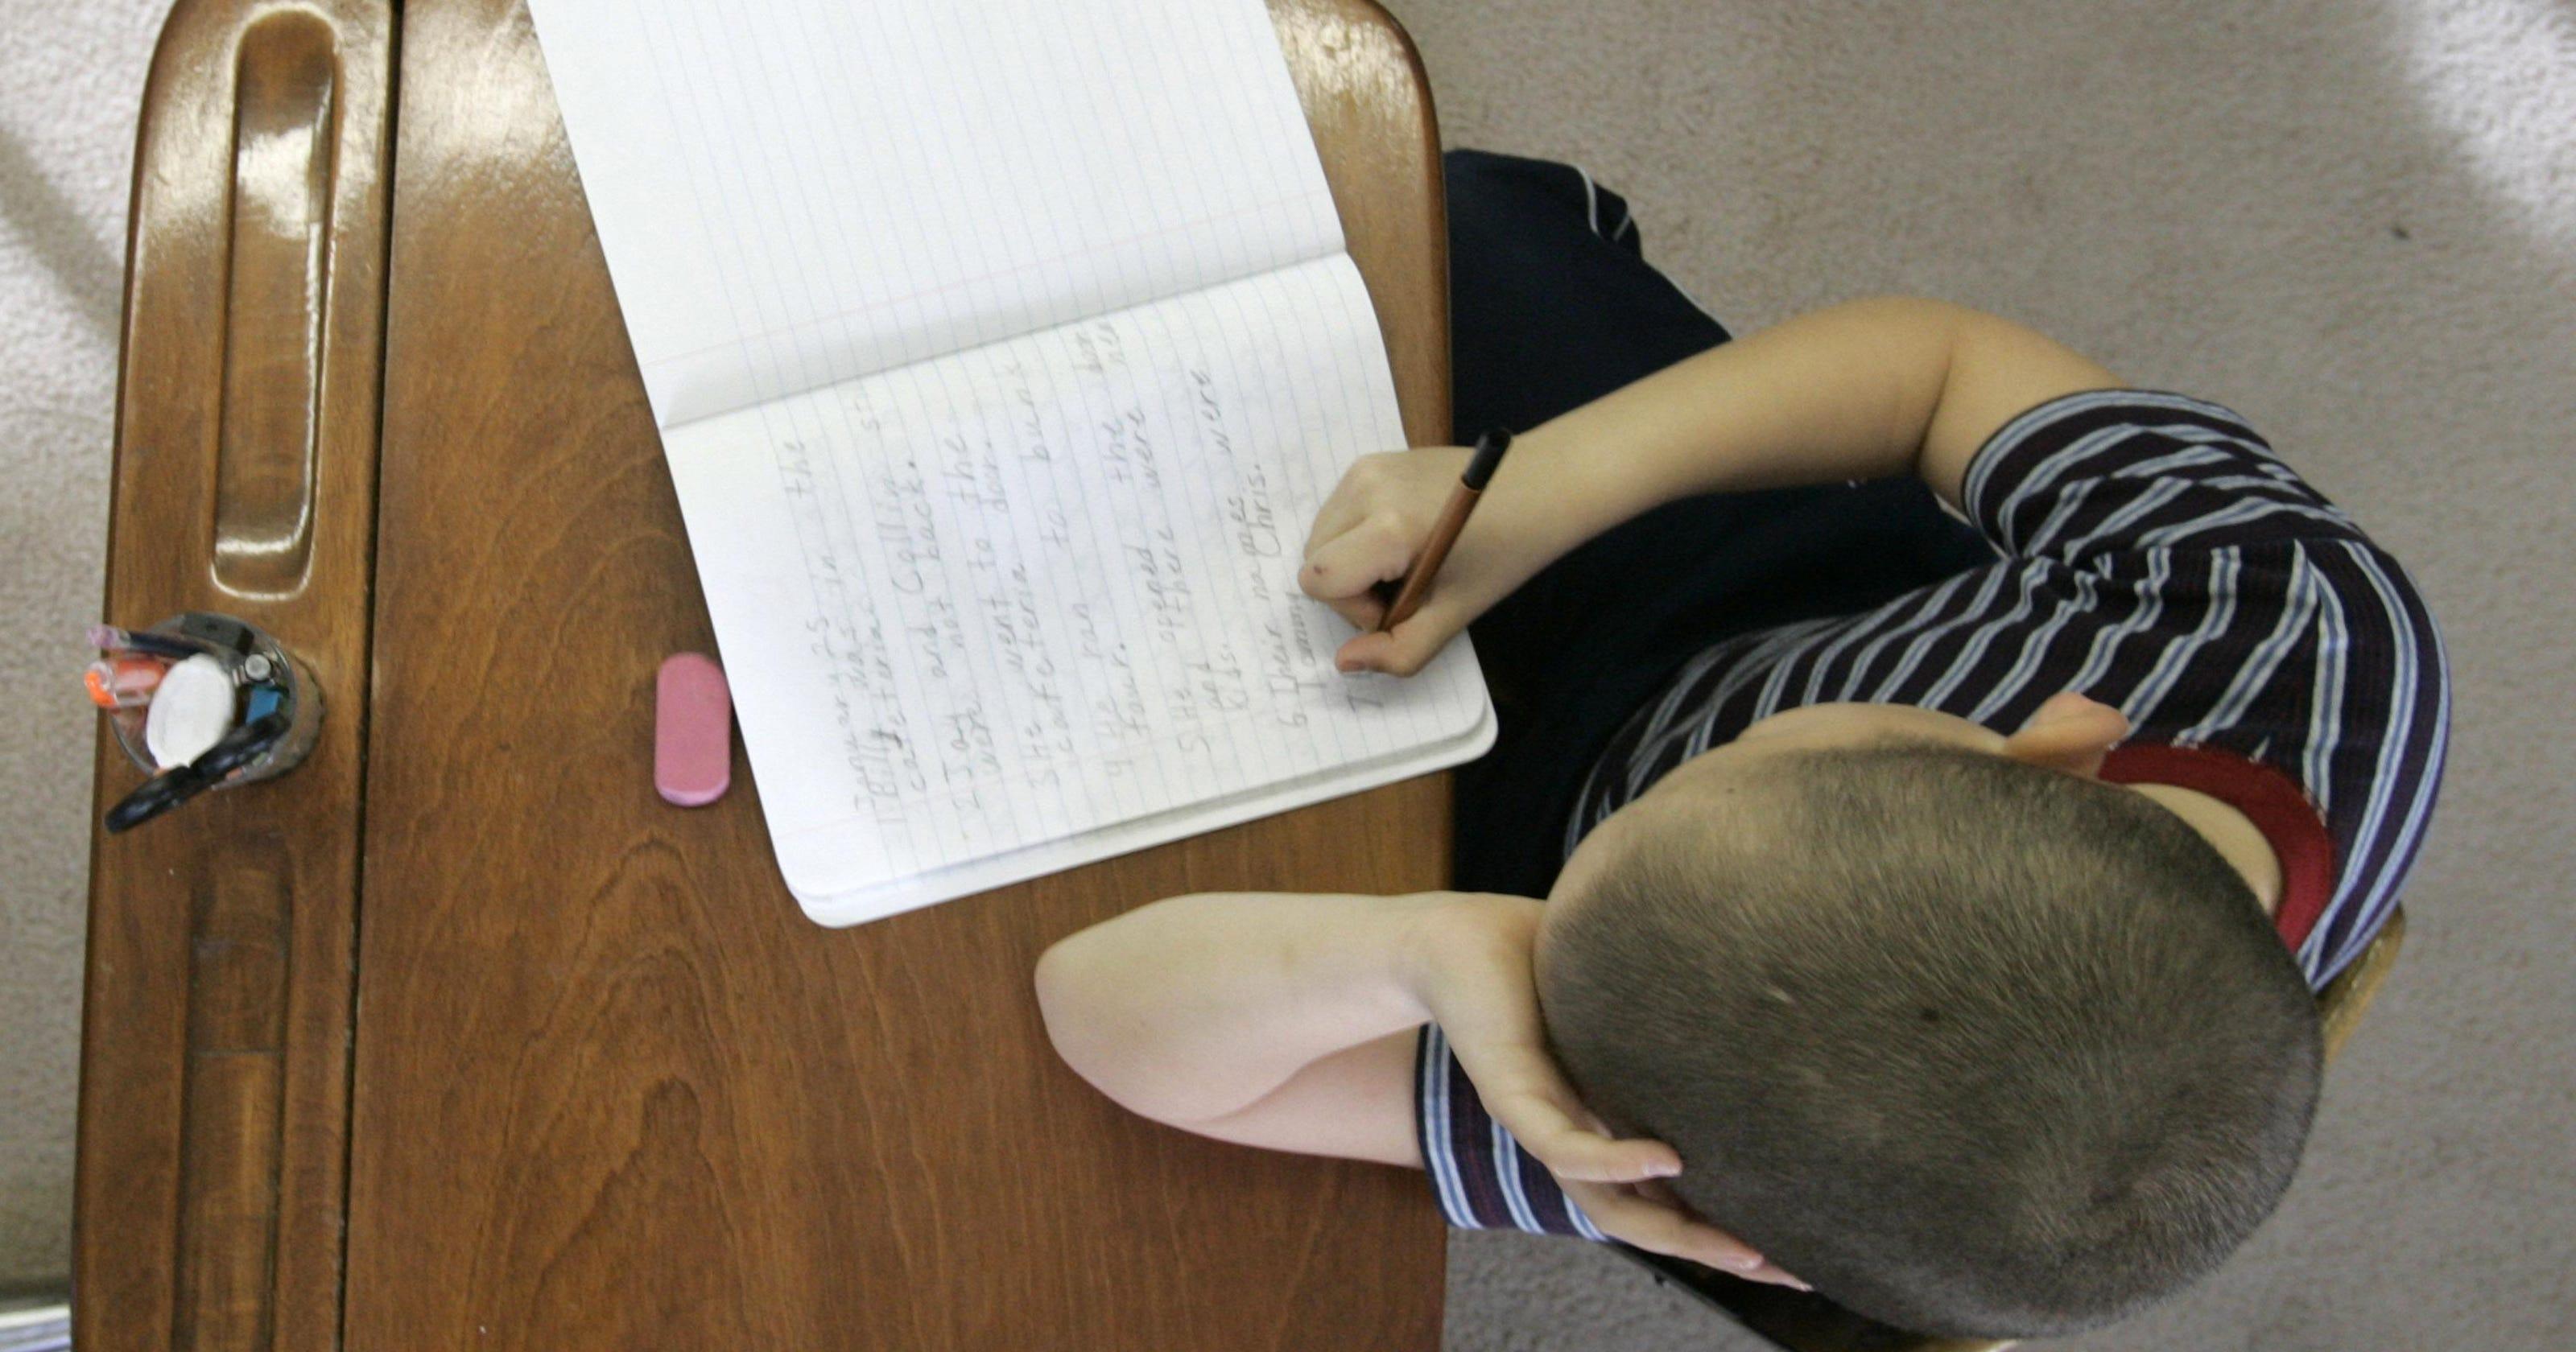 Math homework shows common sense lacking in Common Core